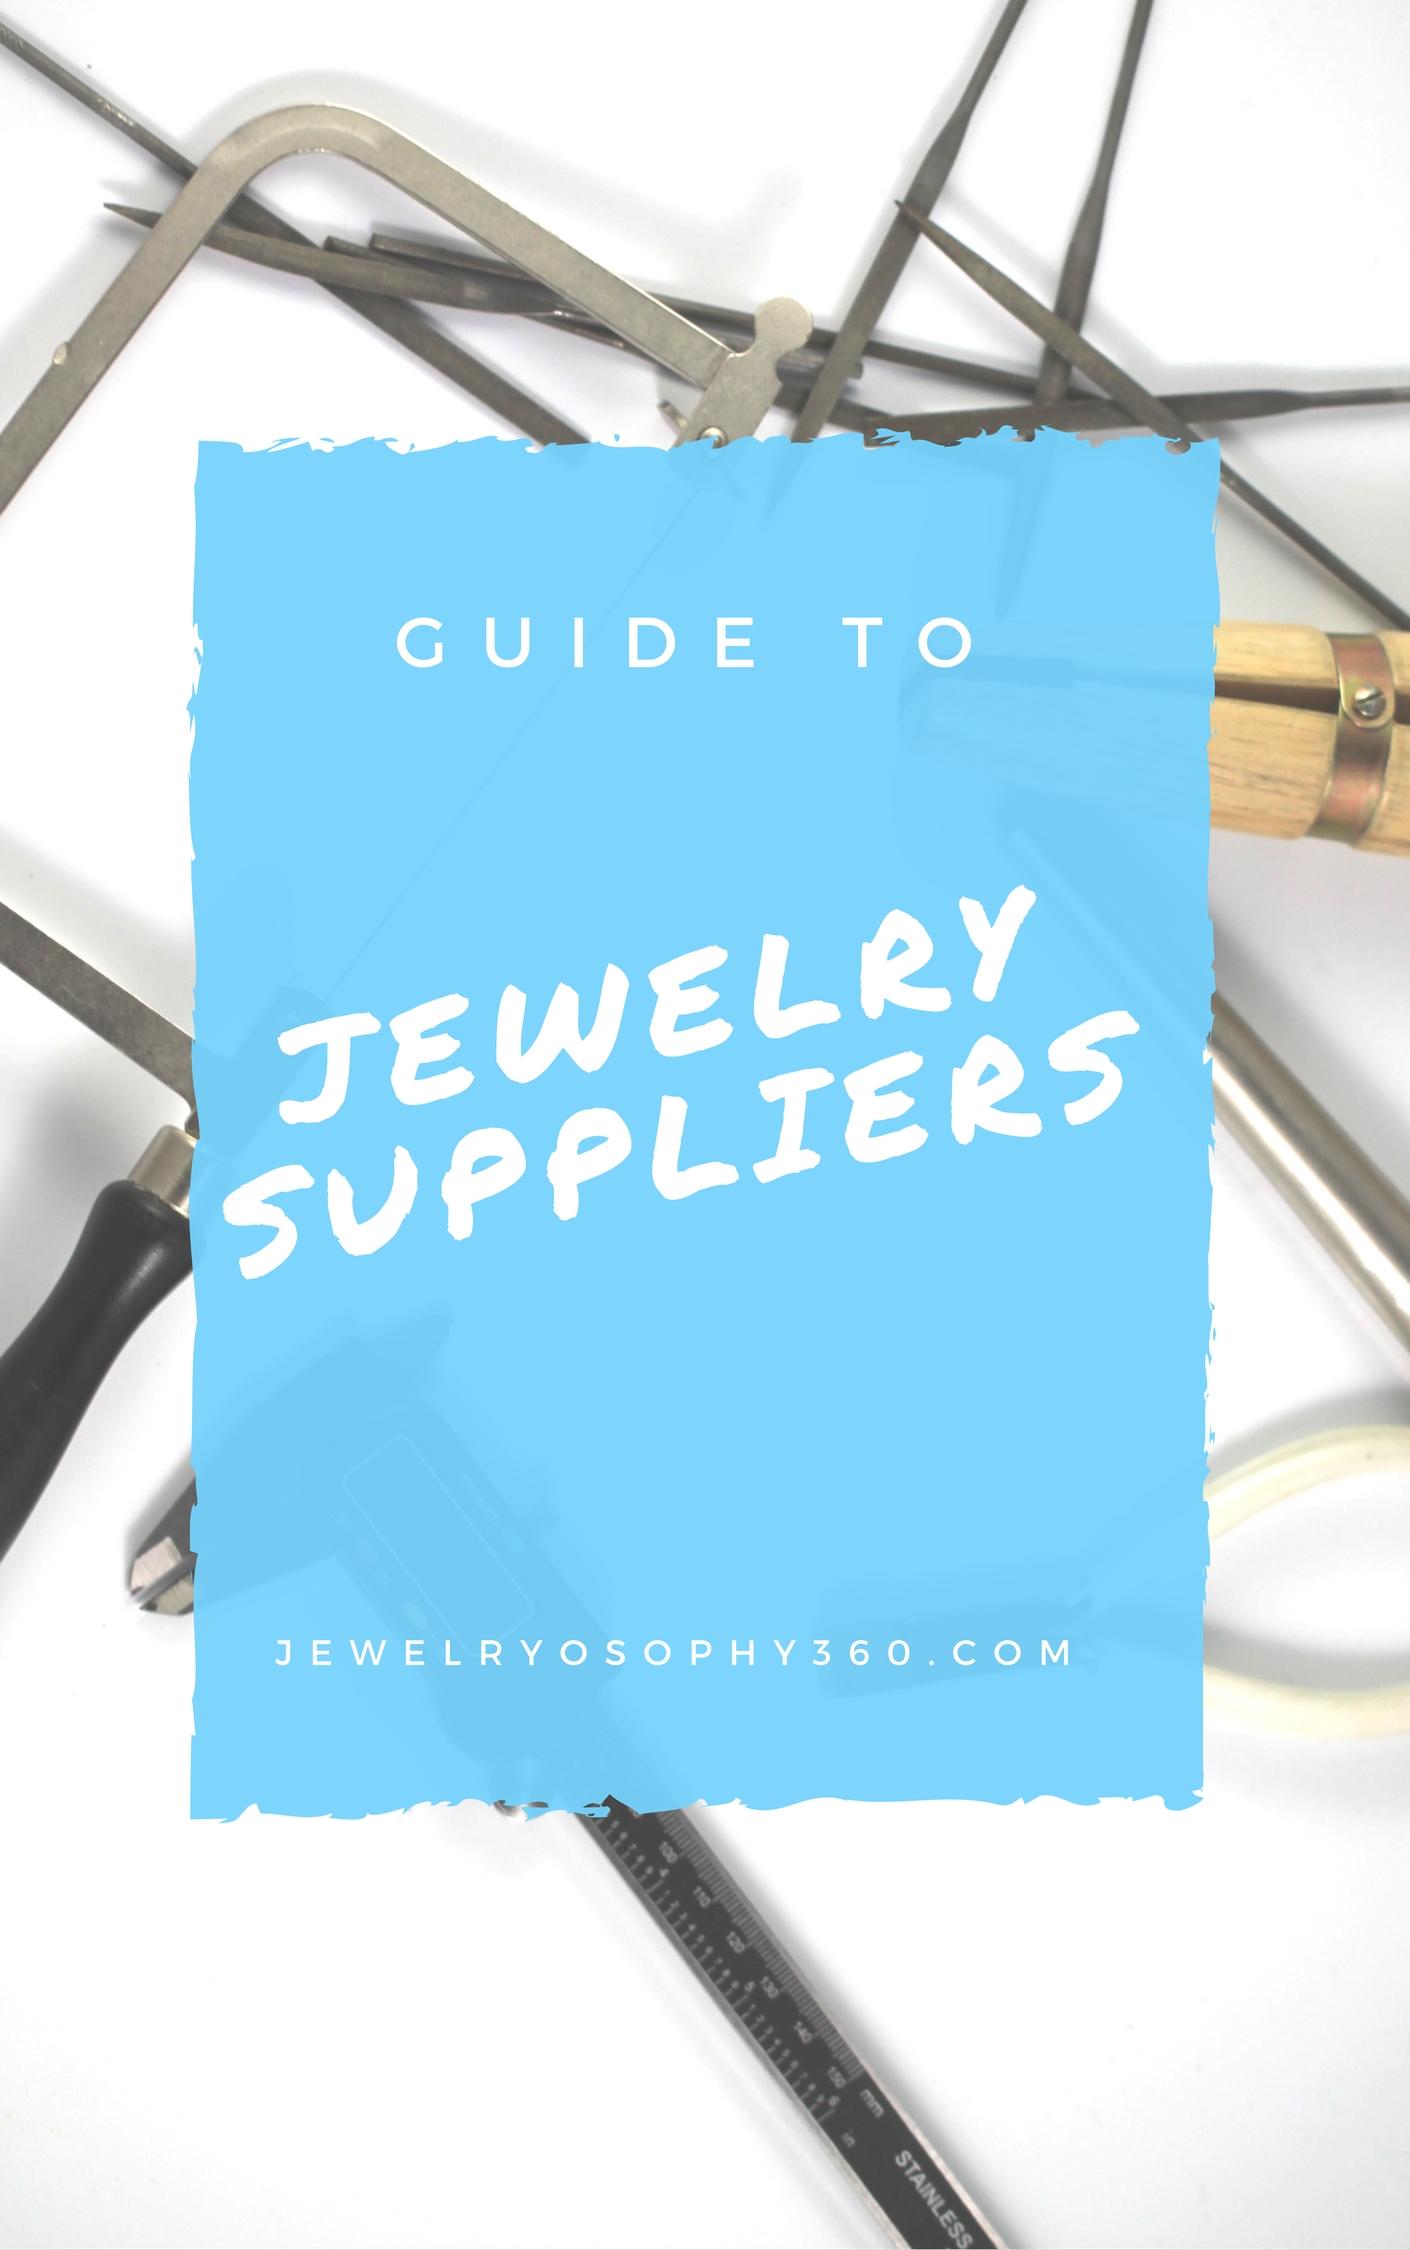 jewelrysuppliers.jpg